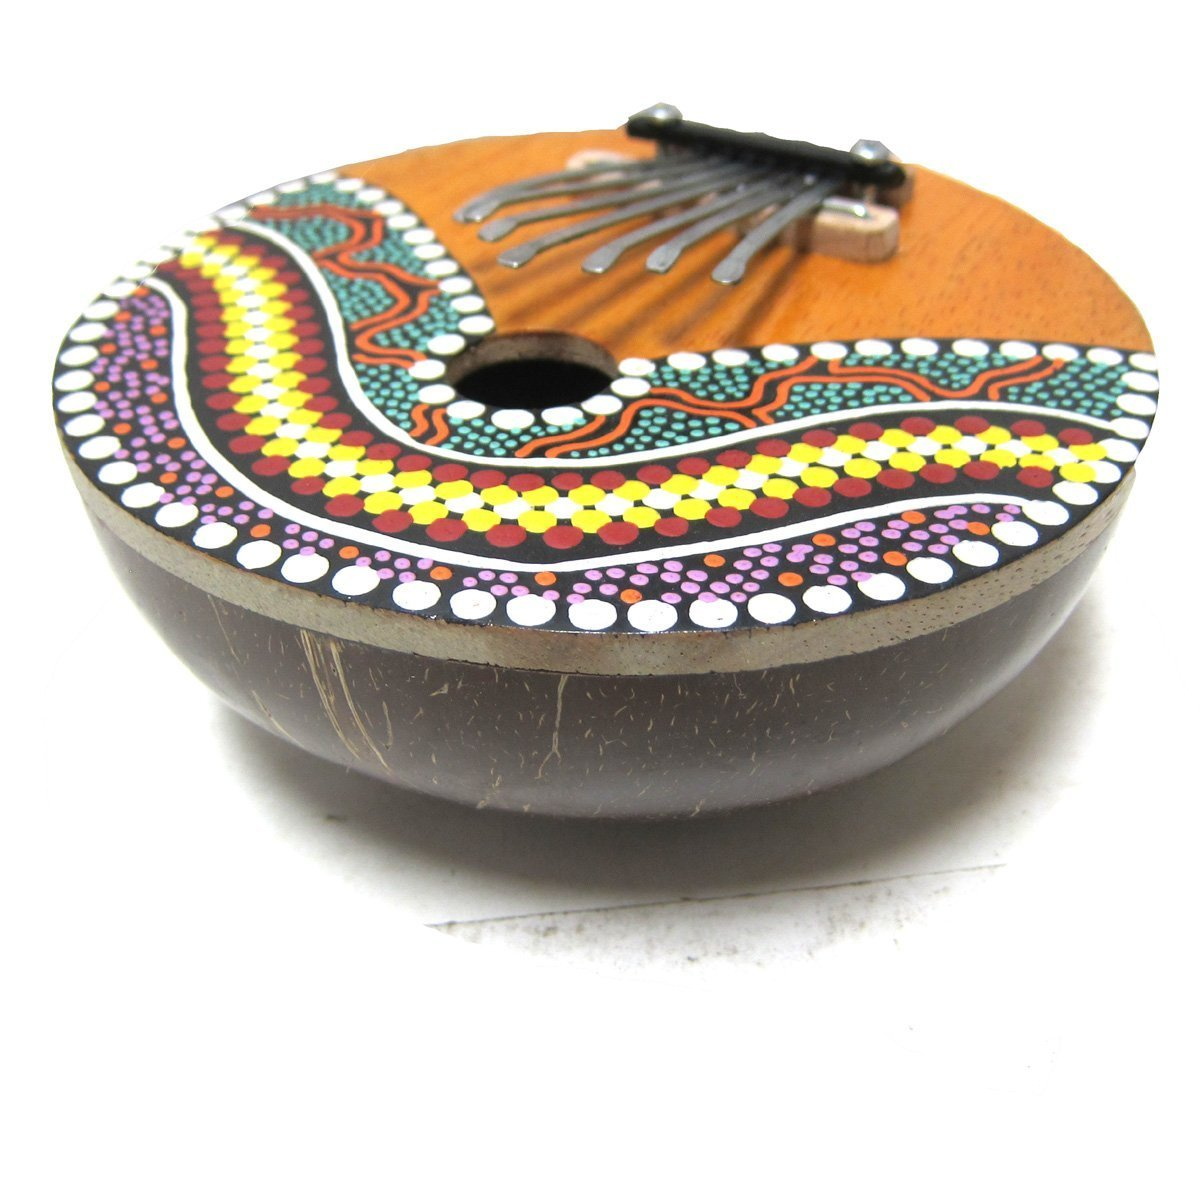 Kalimba Thumb Piano 7 keys Tunable Coconut Shell Painted Finger Thumb Piano Mbira Kalimba Tines Original Wood Kalimba Hugh Tracey Marimba Percussion Musical Instrument by Bethlehem Gifts TM